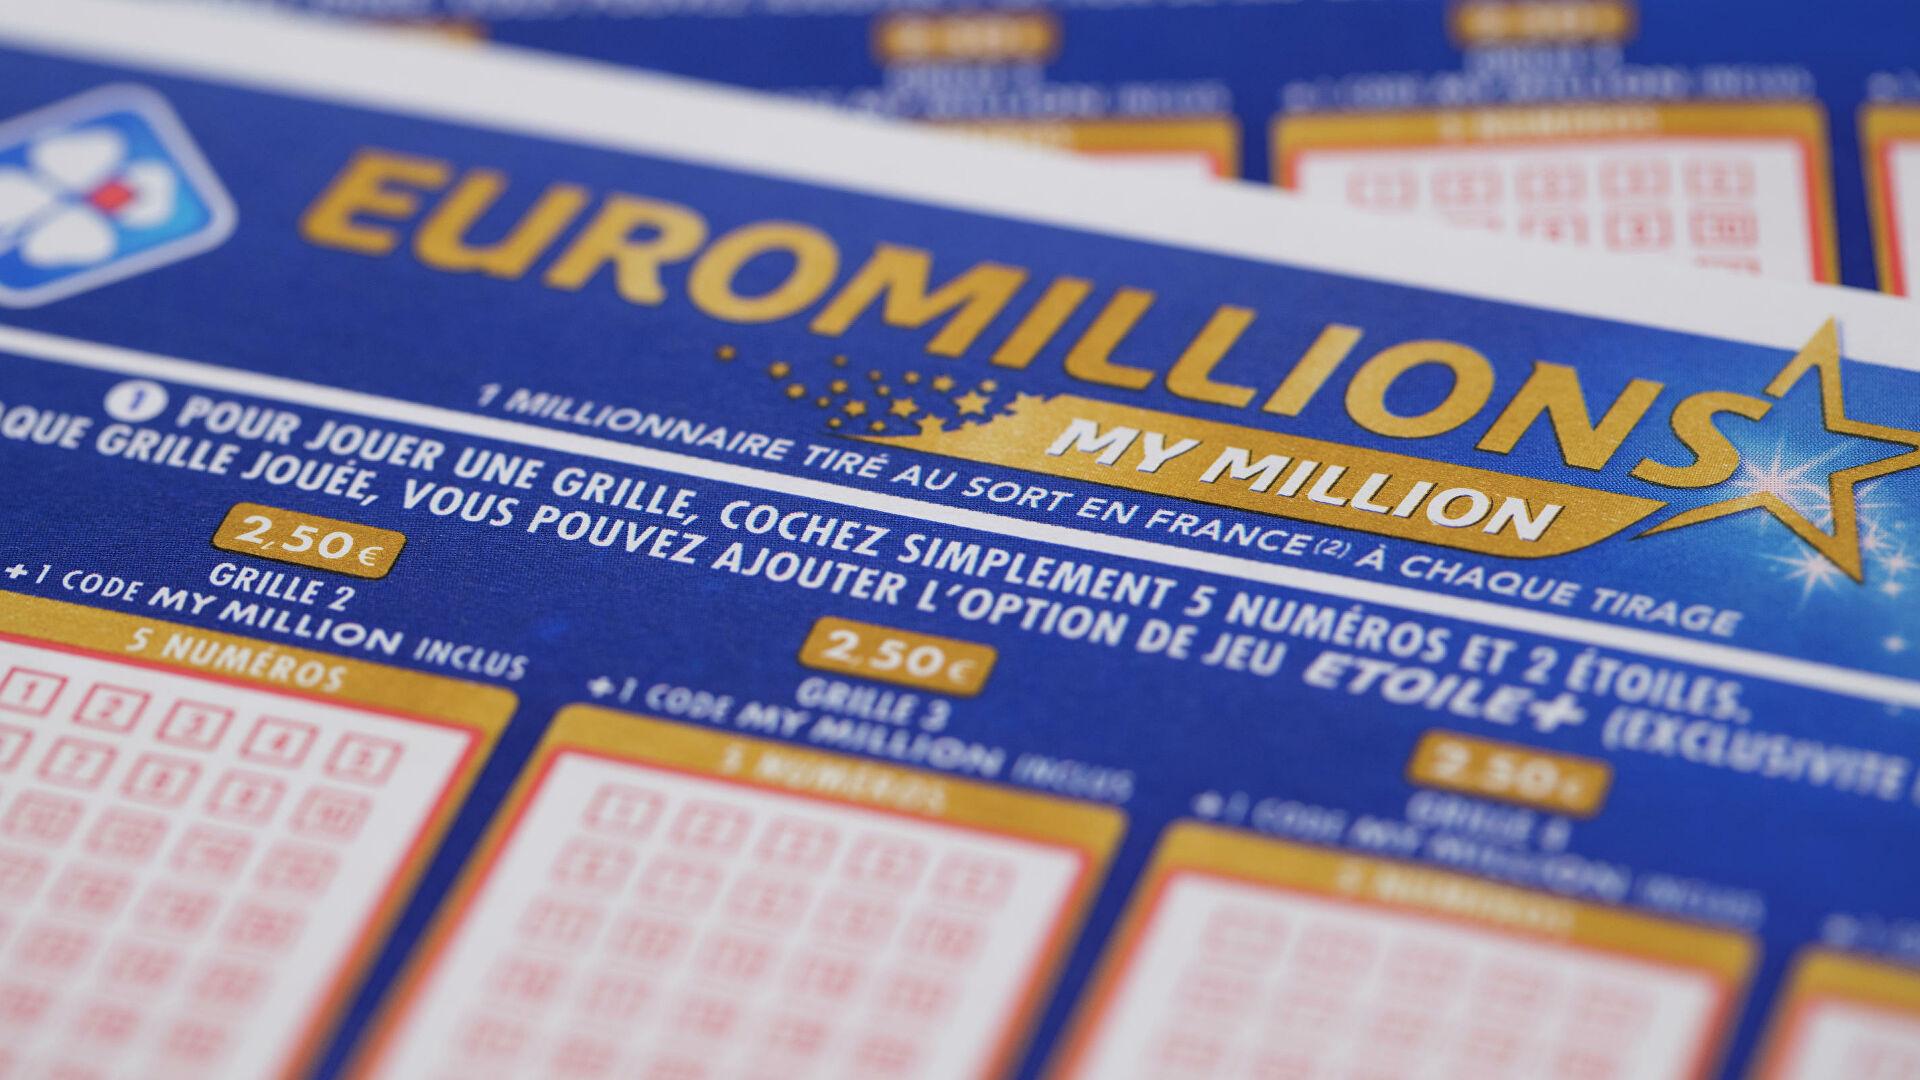 Tax on euromillions winnings